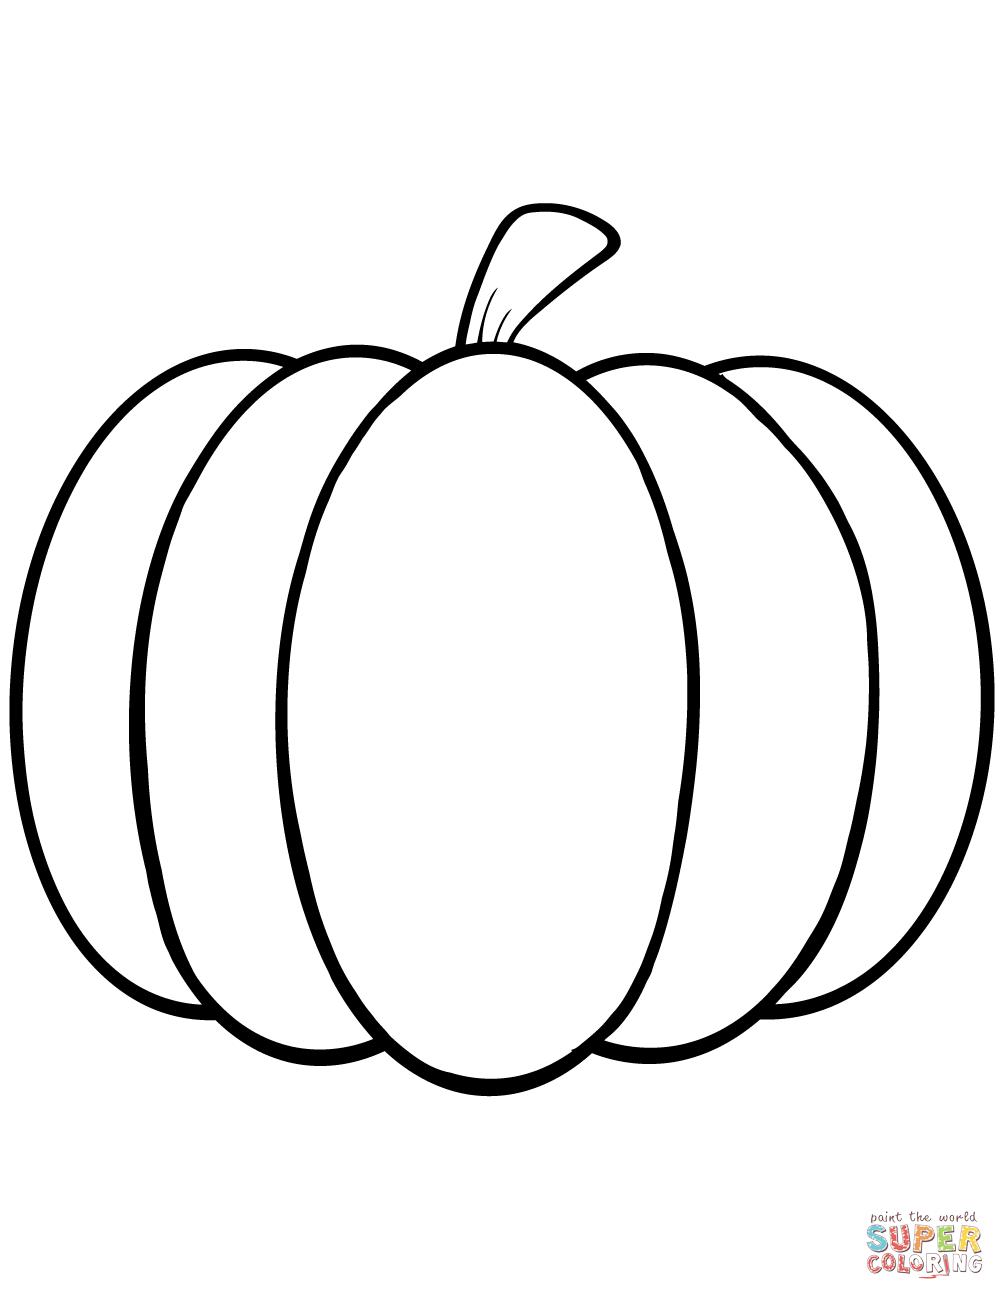 pumpkin coloring pattern don39t eat the paste pumpkin to color coloring pattern pumpkin